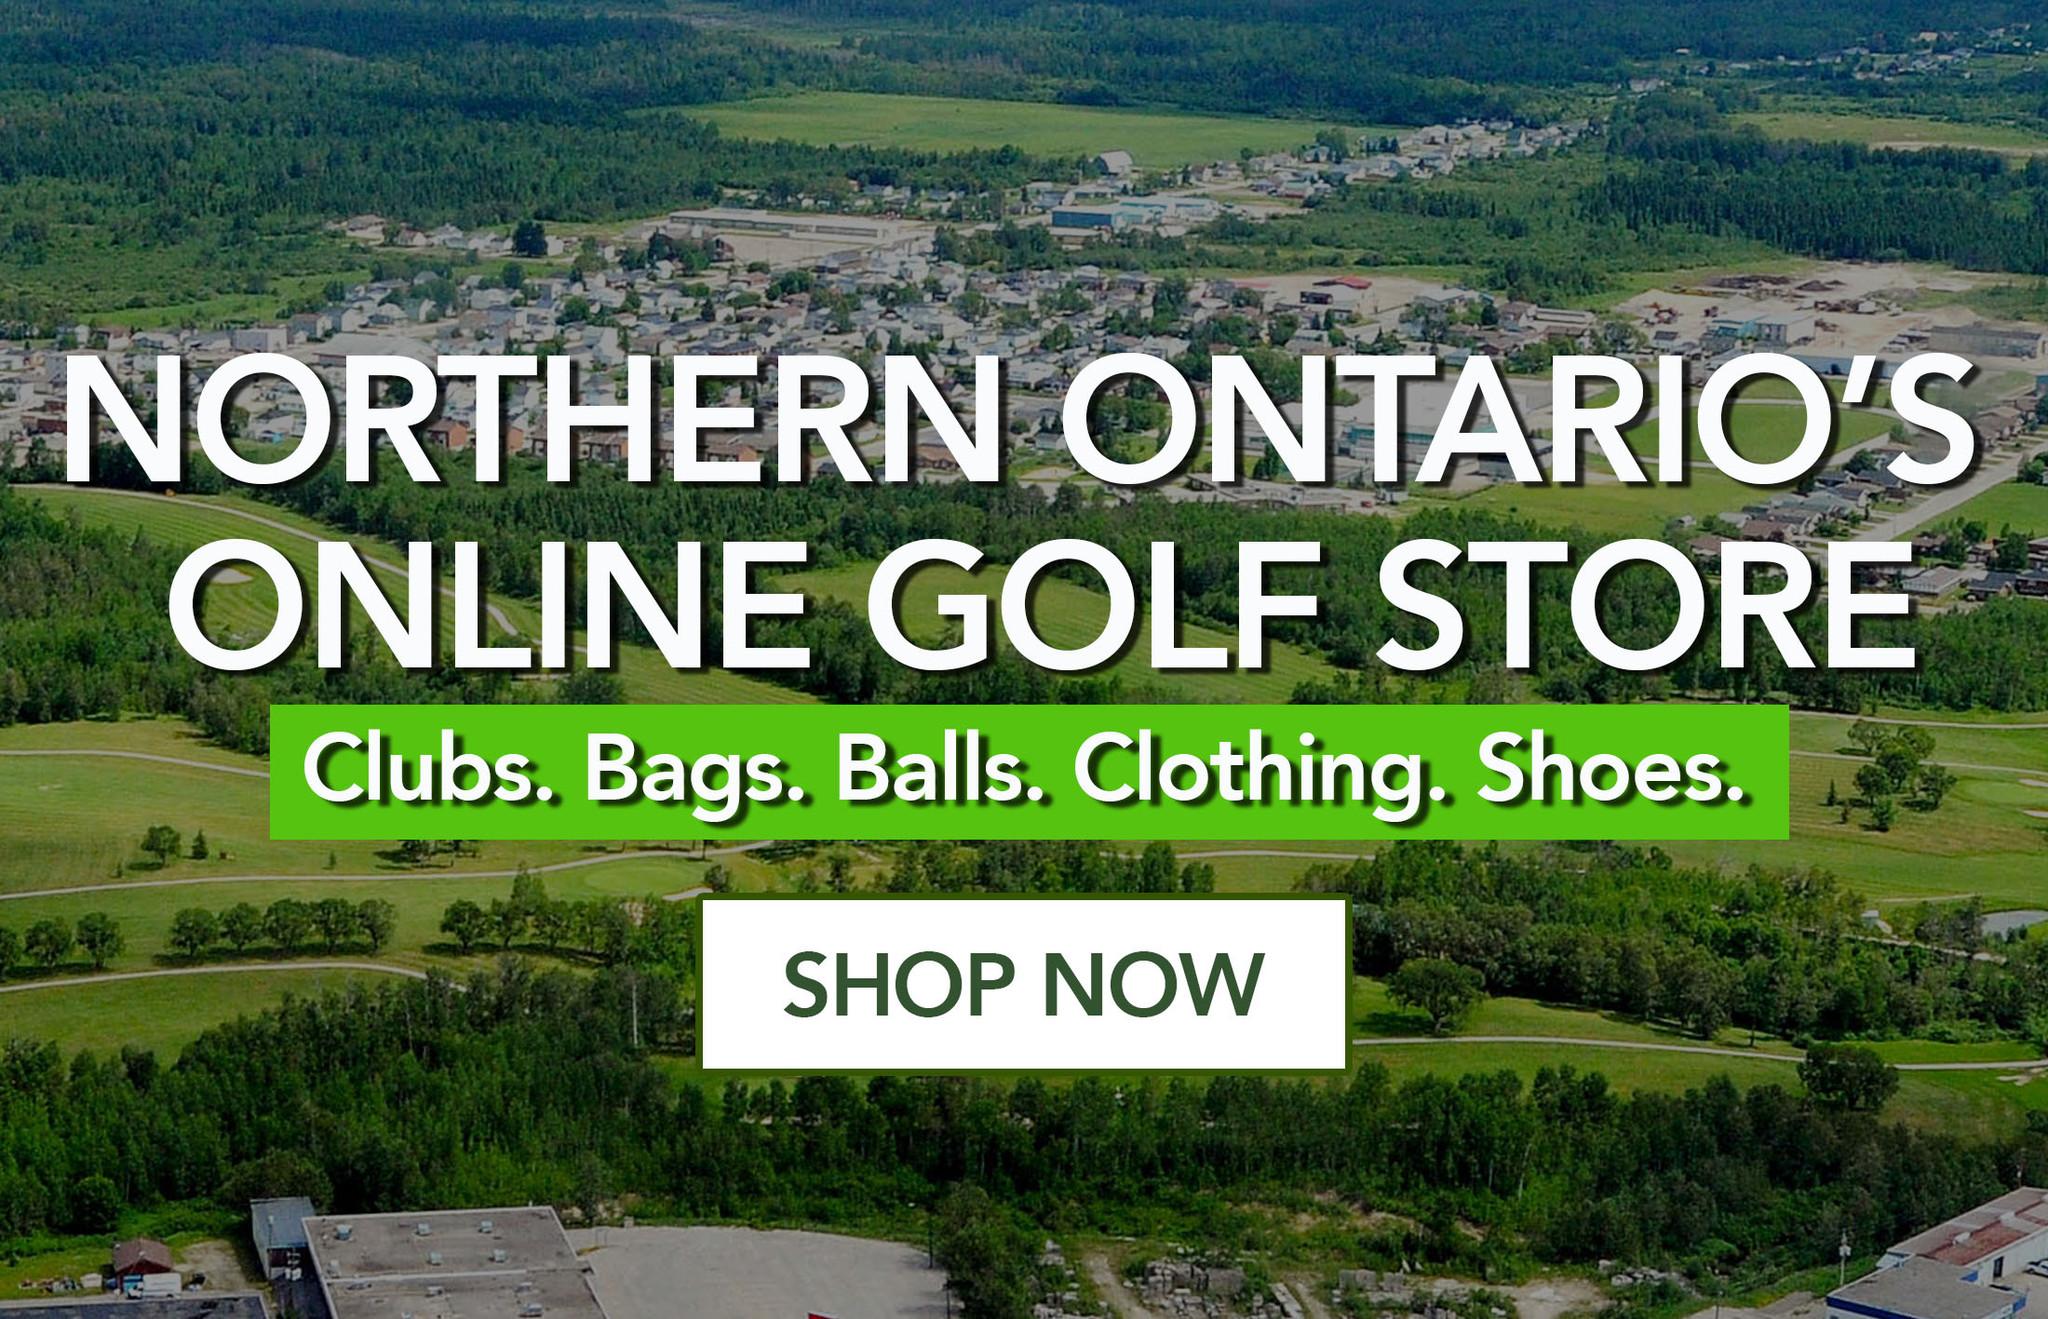 Northern Ontario's Online Golf Store